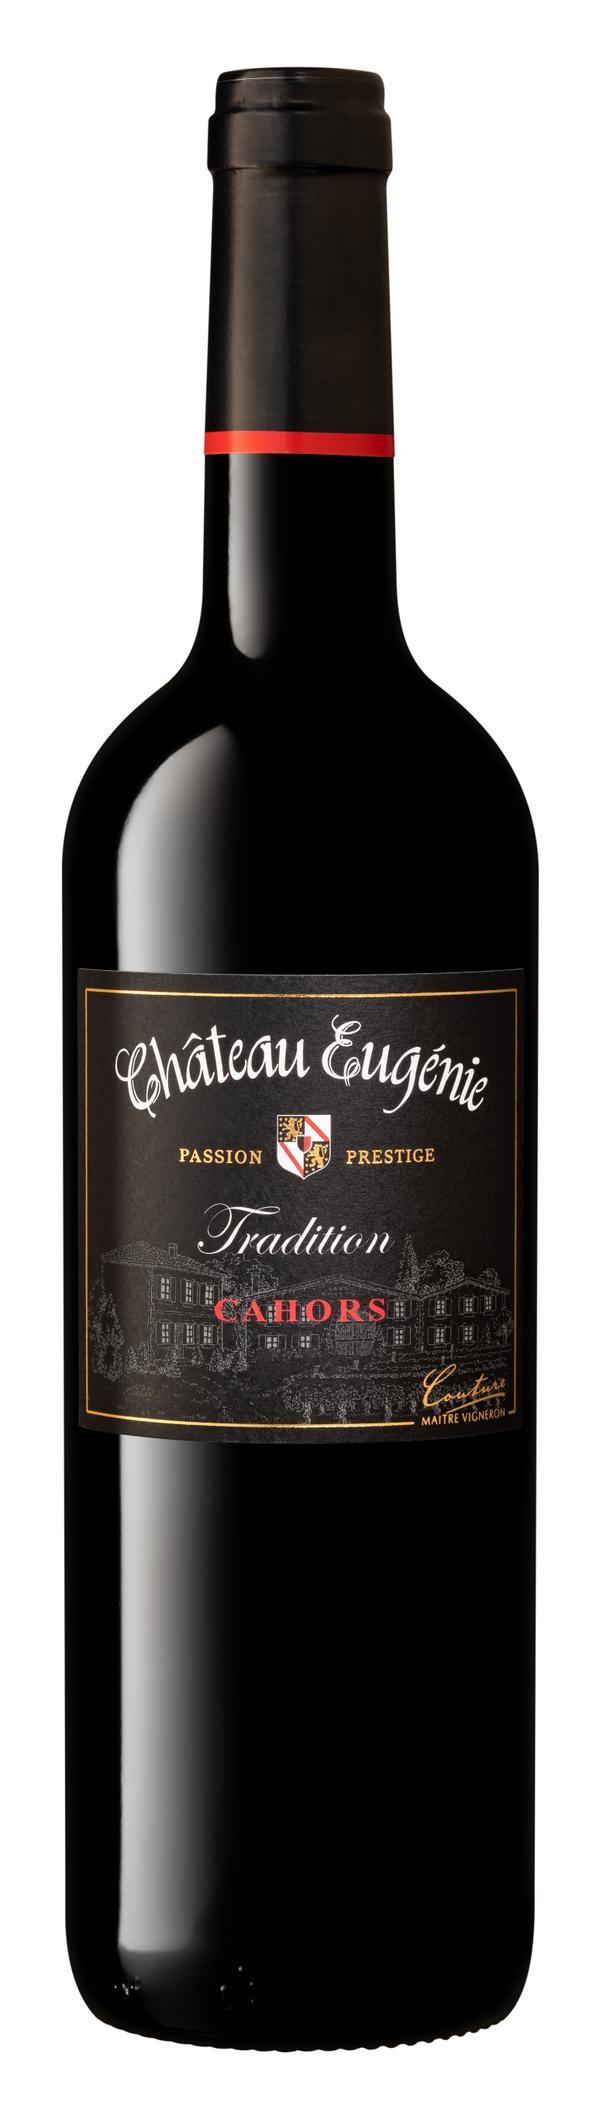 Château Eugénie tradition 2018 AOP Cahors